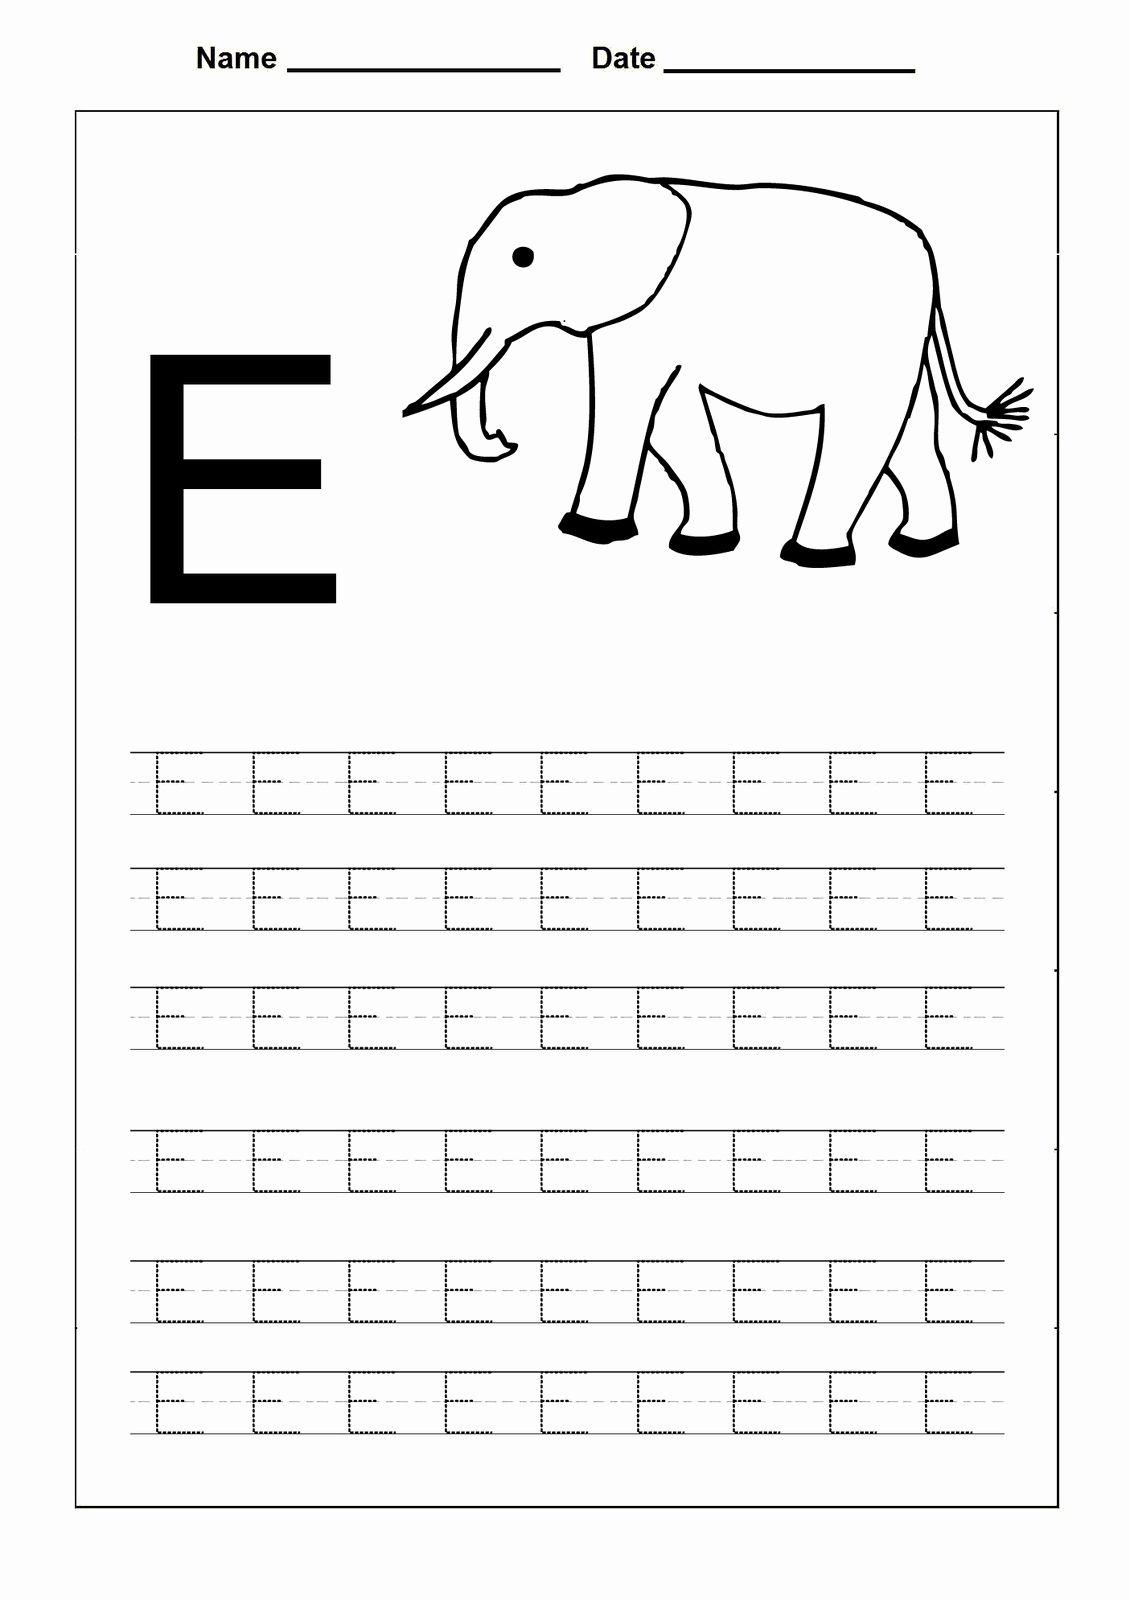 Alphabet Coloring Pages Twisty Noodle Best Of 49 Letter E for Letter H Worksheets Twisty Noodle